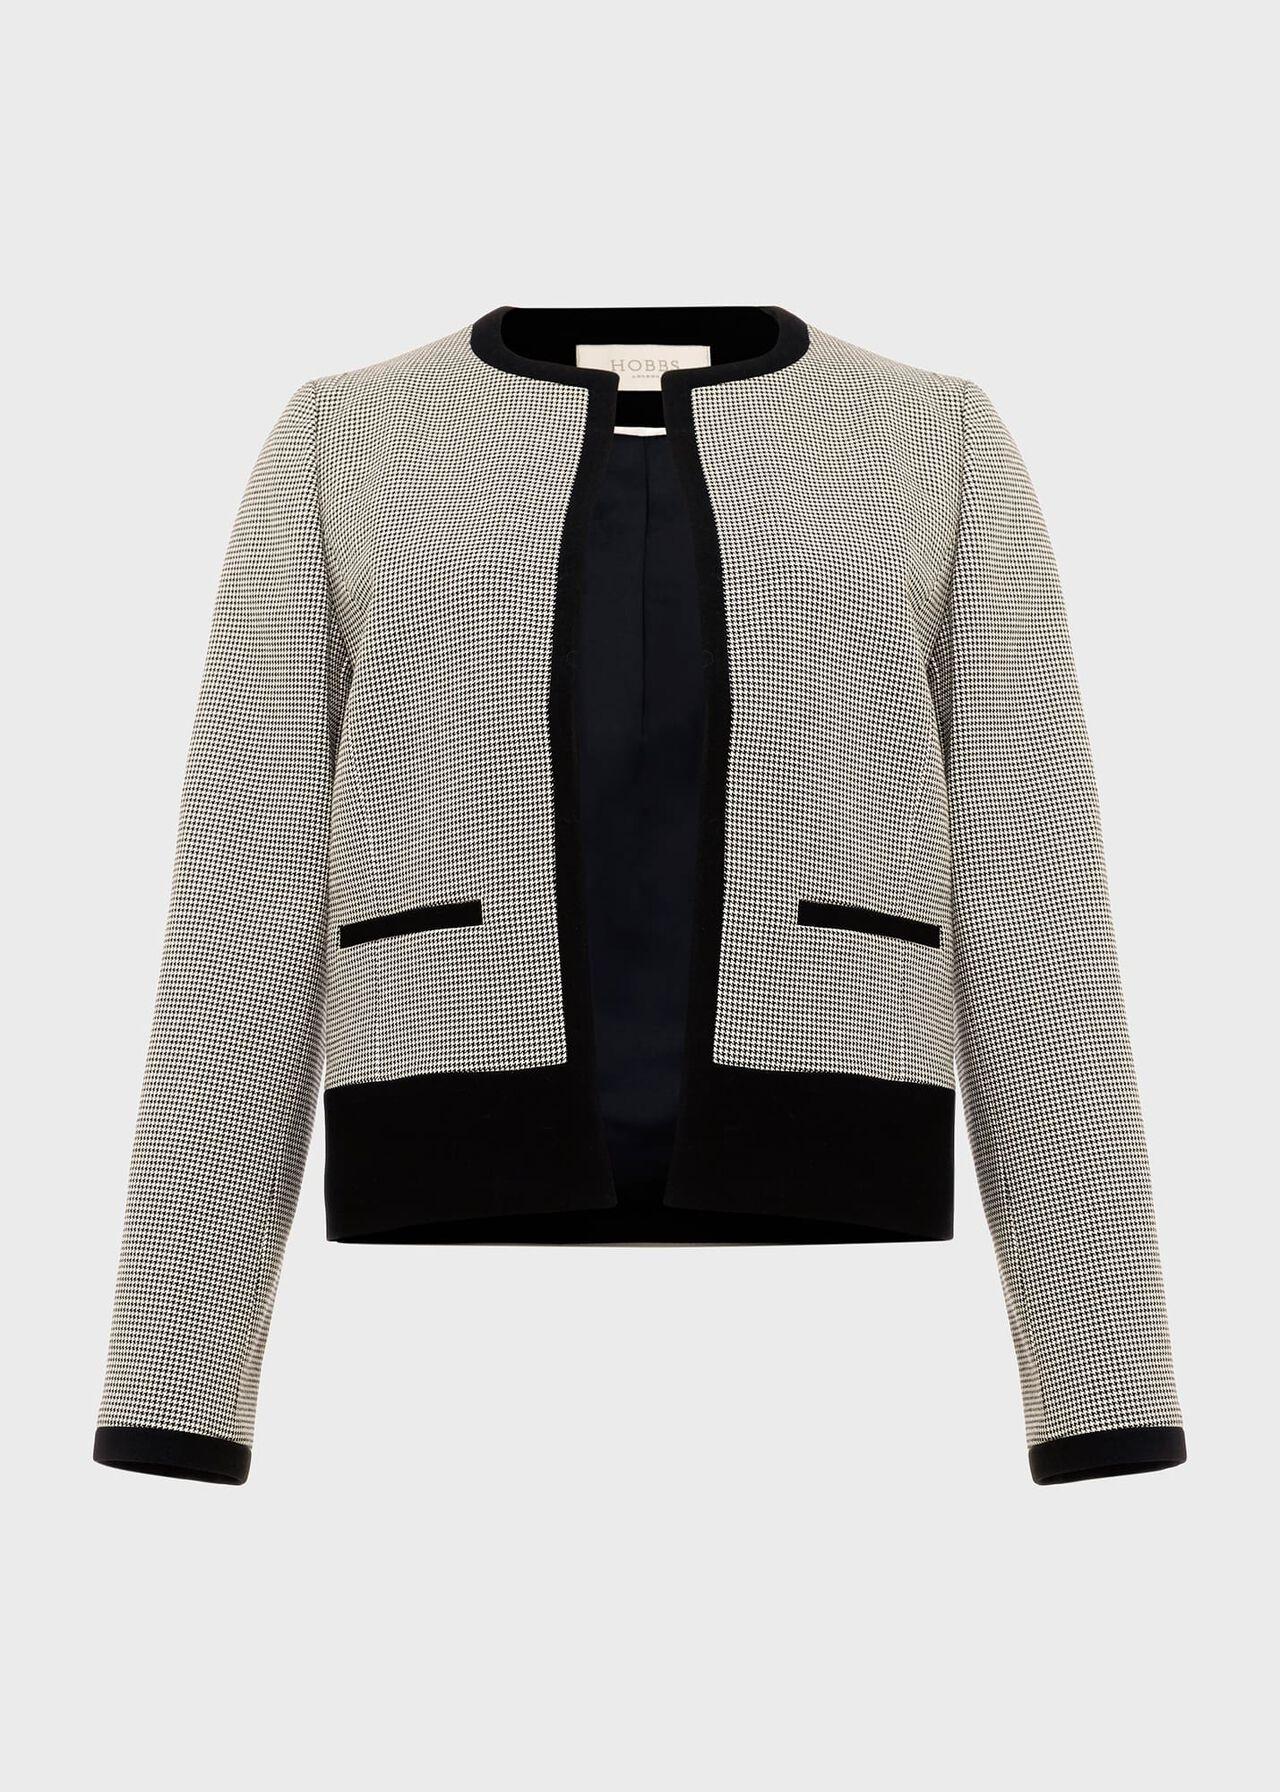 Sienna Houndstooth Jacket, Ivory Black, hi-res